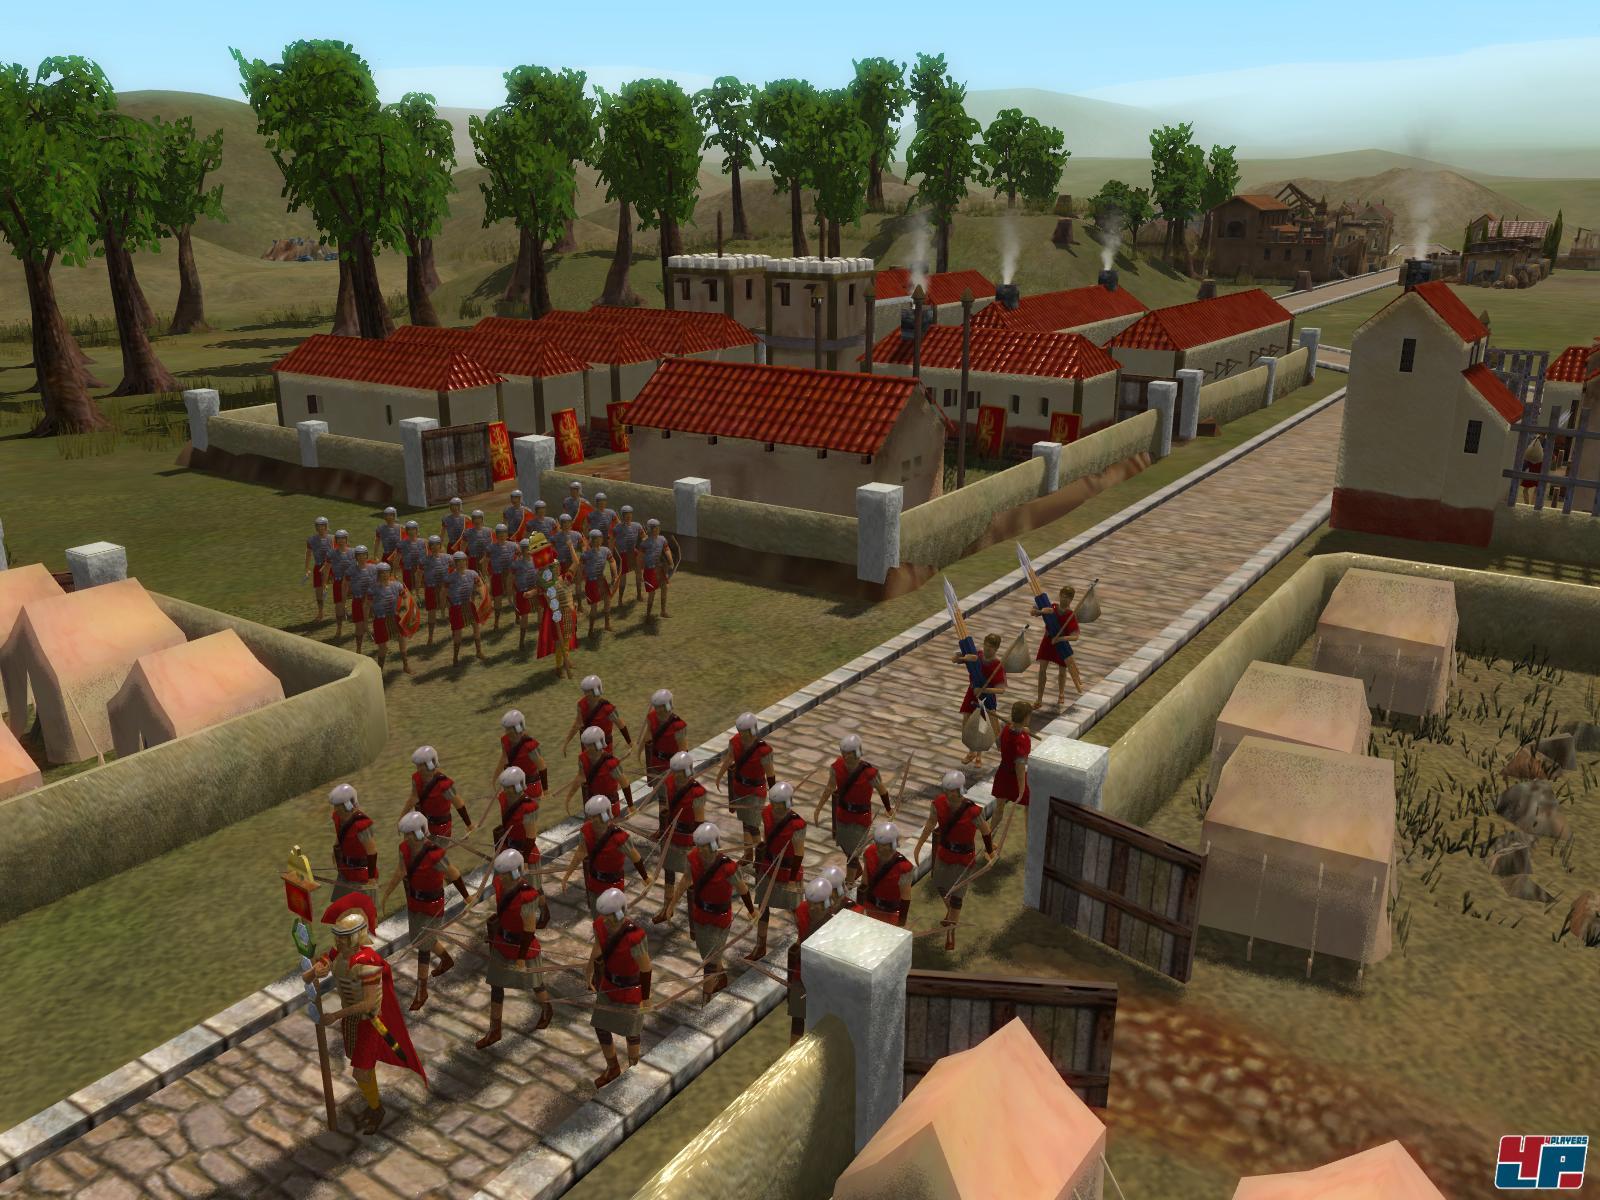 Cкачать Цезарь IV Caesar IV 1С-СофтКлаб RUS L. 1.